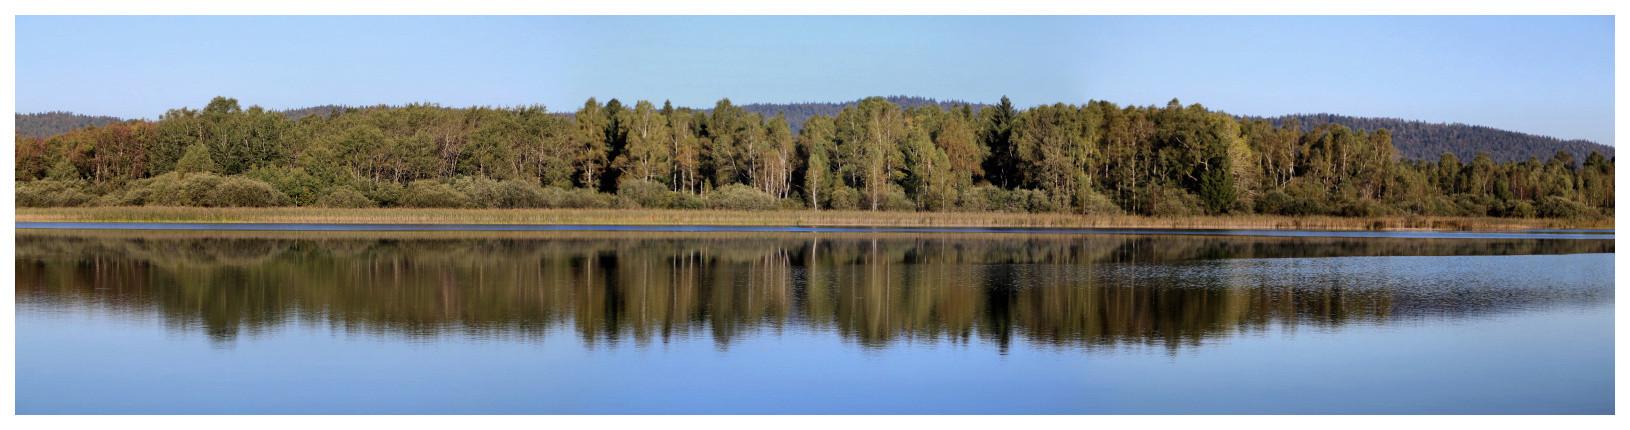 Le lac de l'abbaye de Granvaux Abbaye10